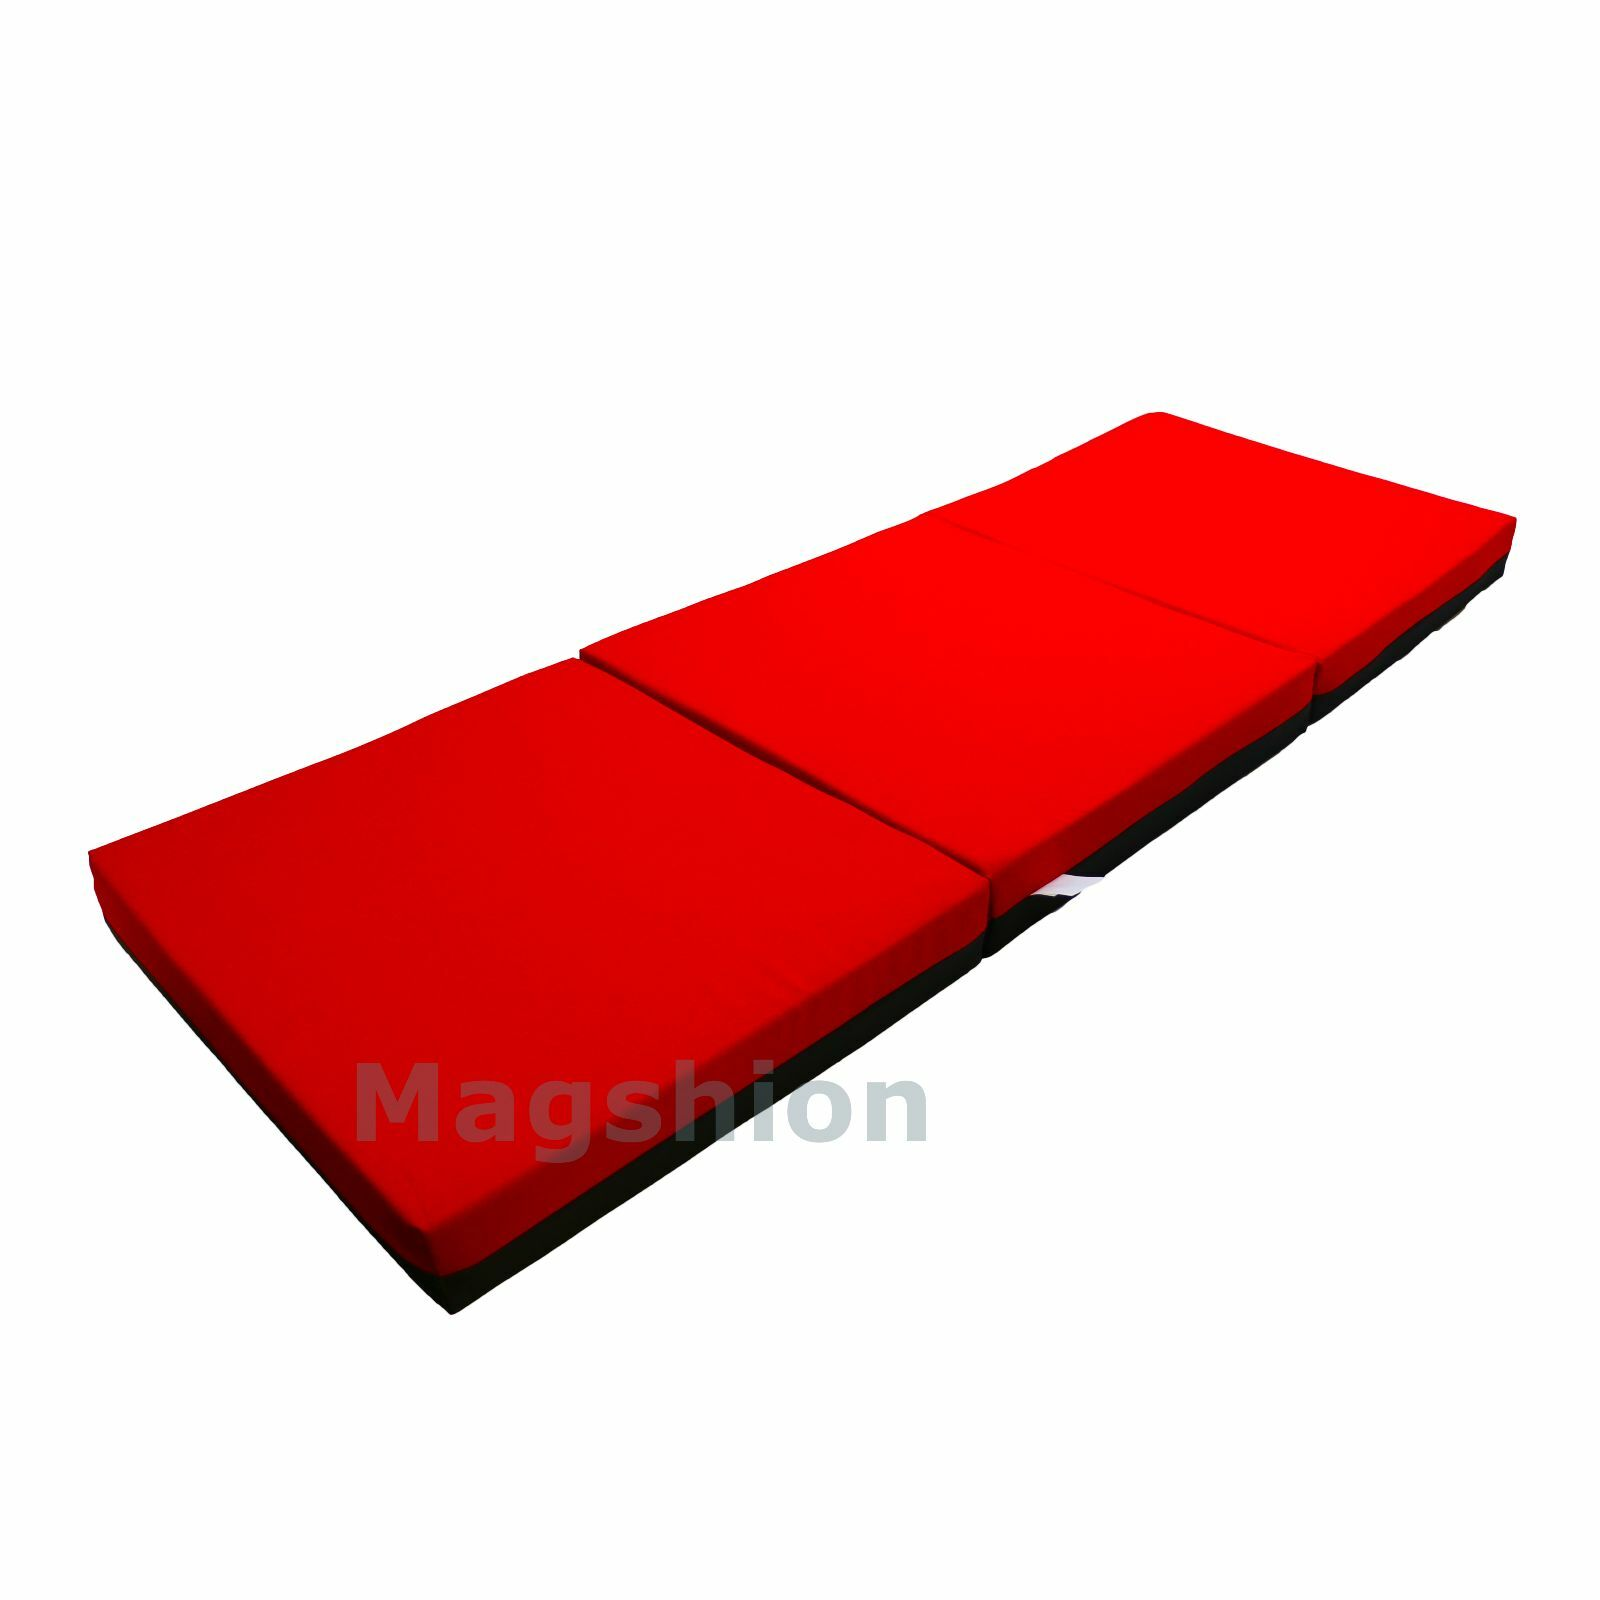 4 Inch Memory Foam Firm Mattress Trifolding Bed Pad Floor Mat Red Black 4 Size Ebay